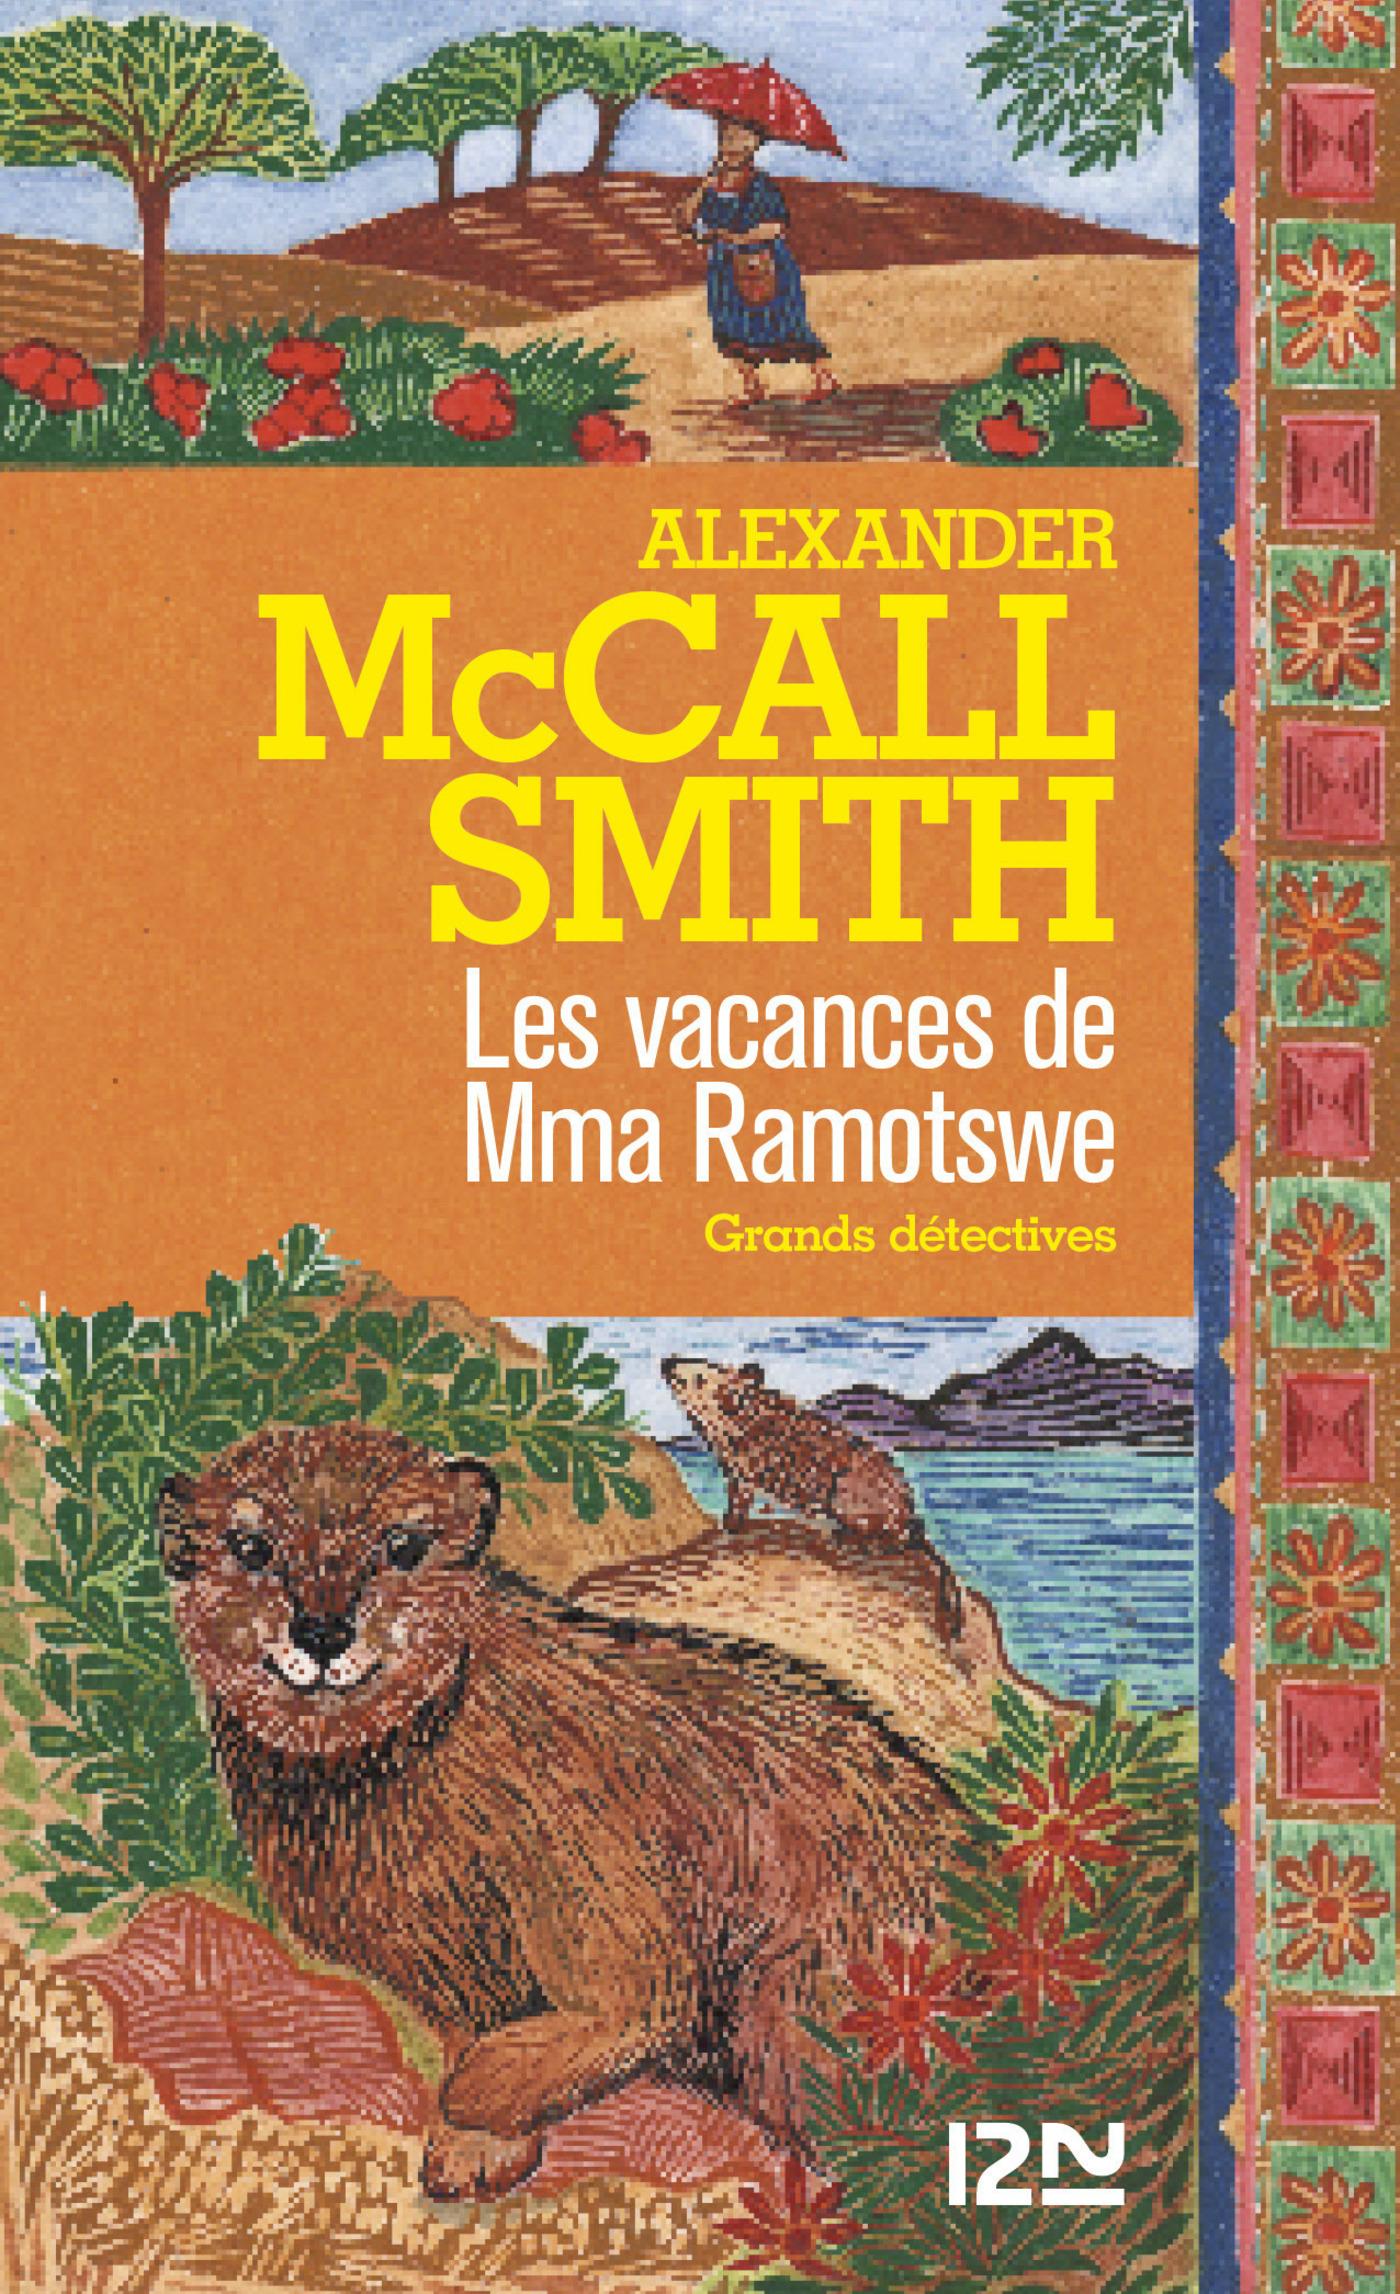 Les vacances de Mma Ramotswe (ebook)